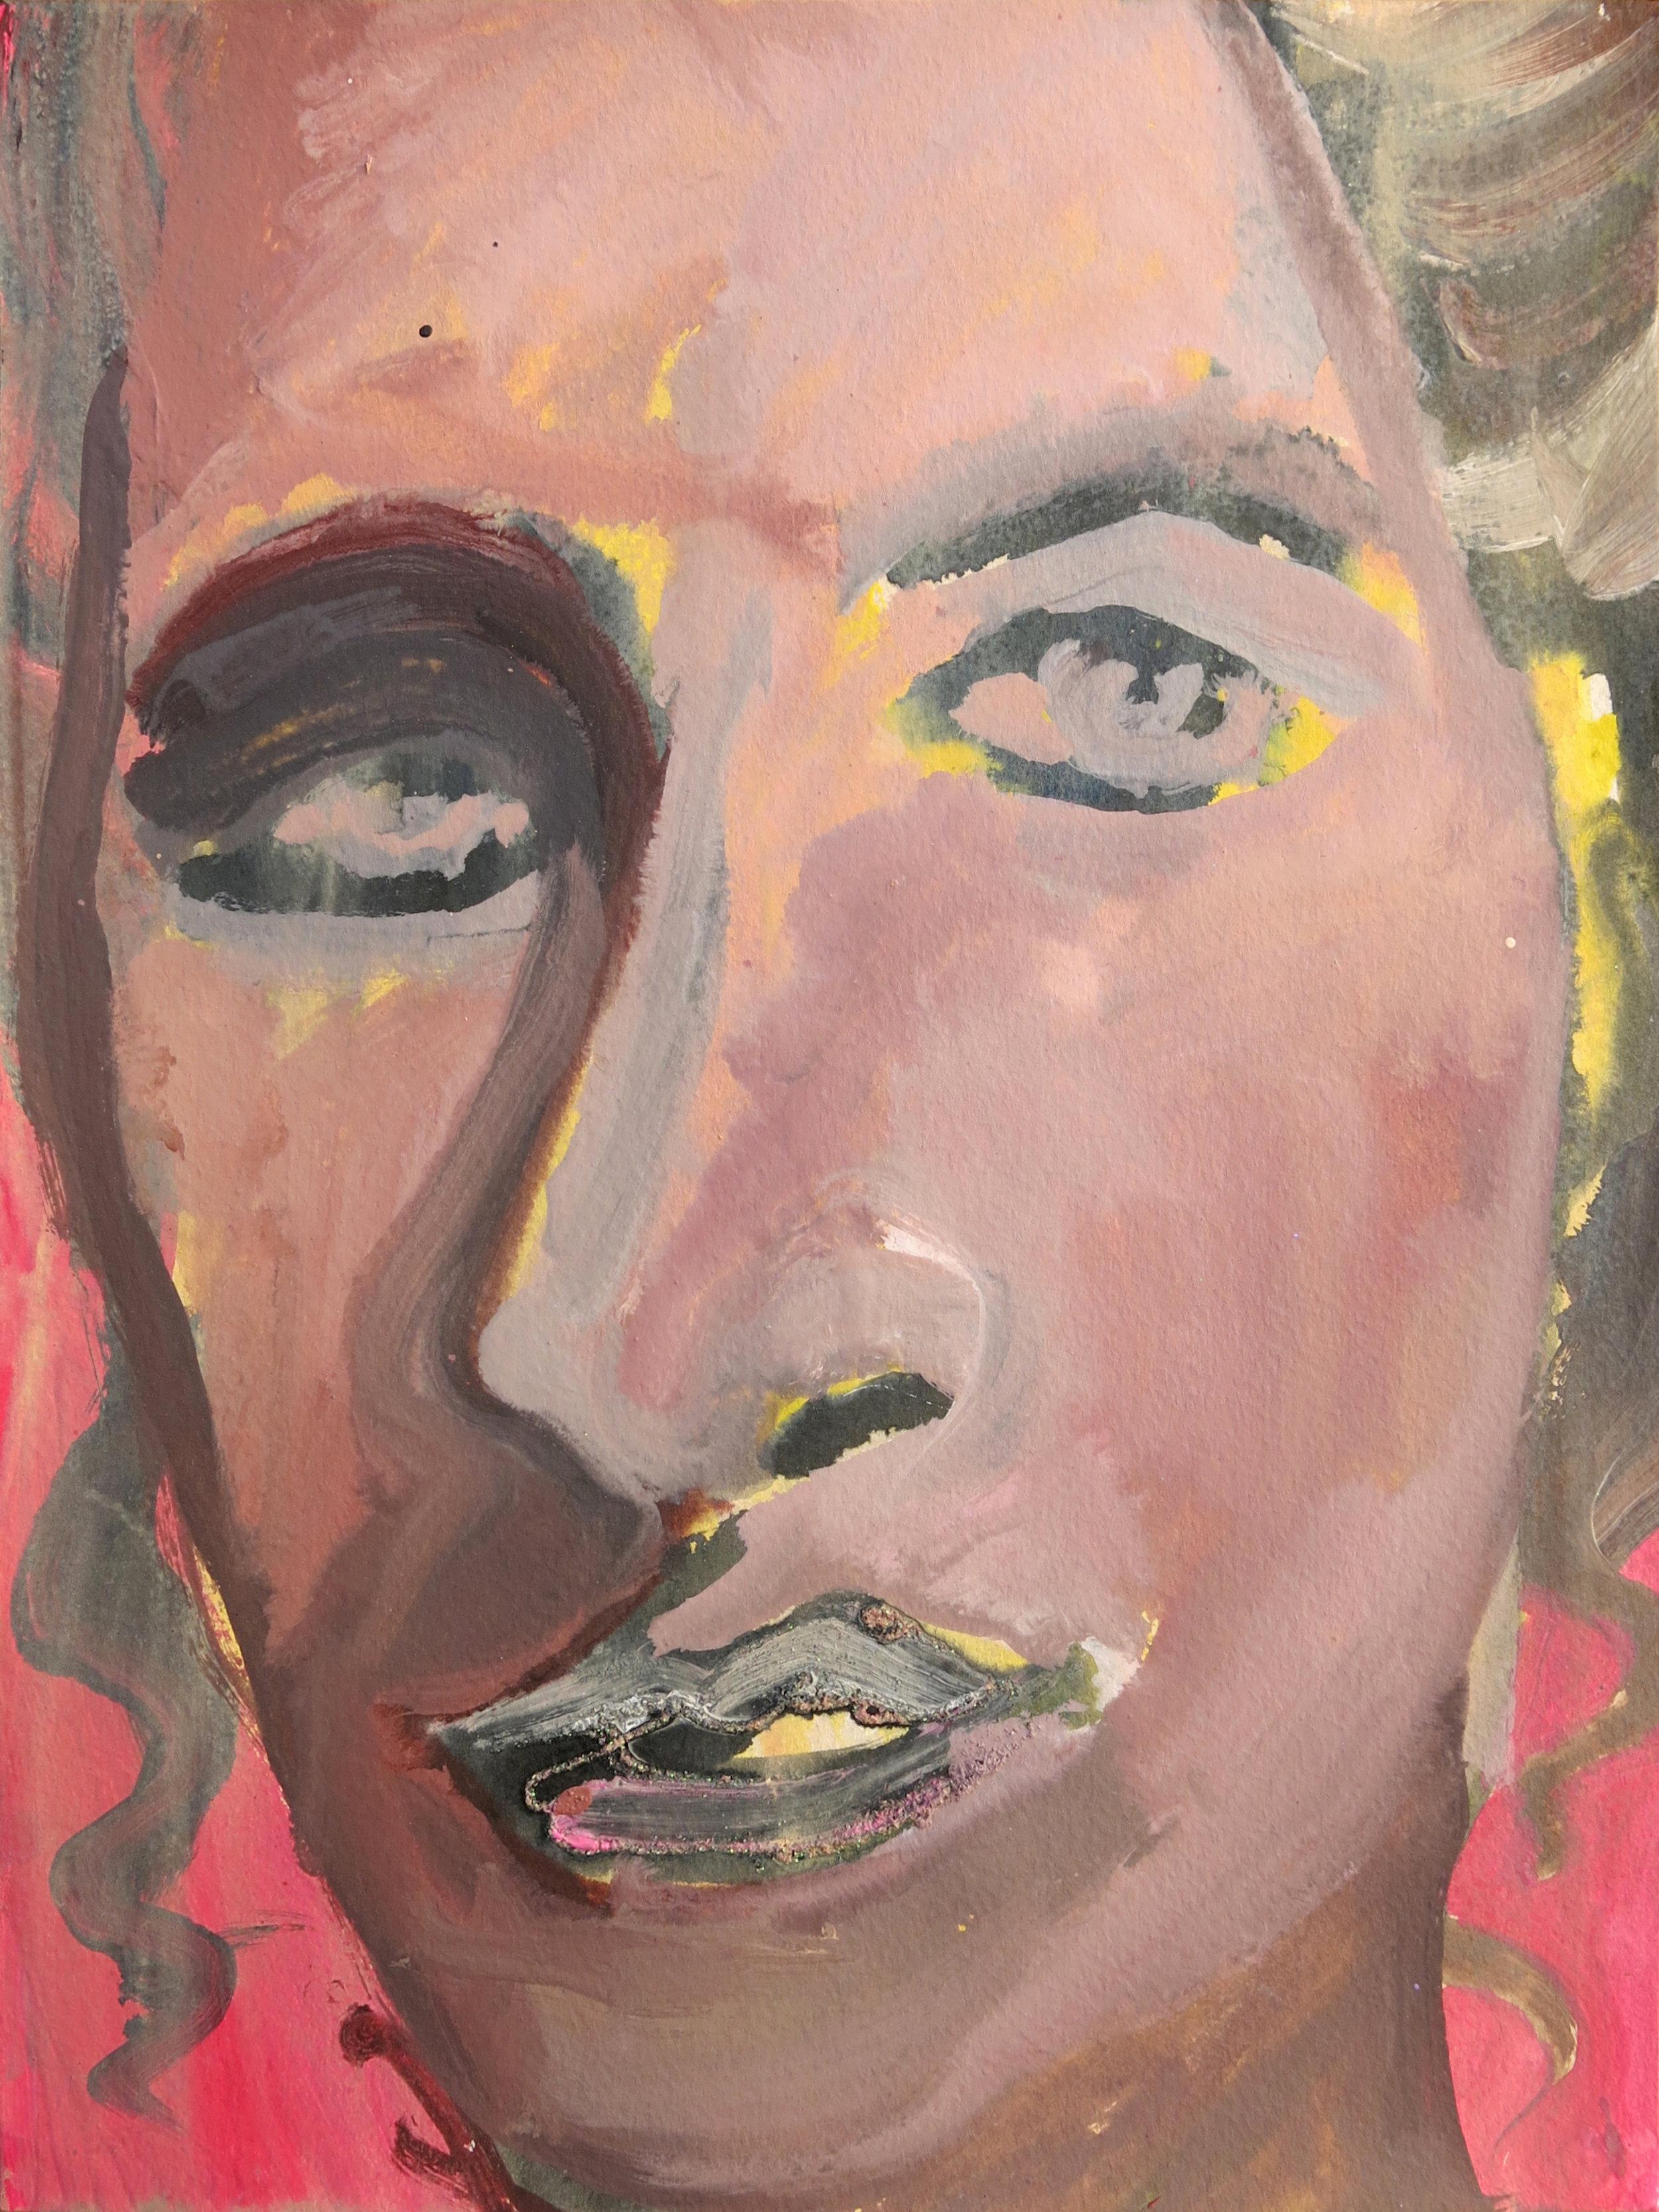 Barbra Streisand Portrait #46